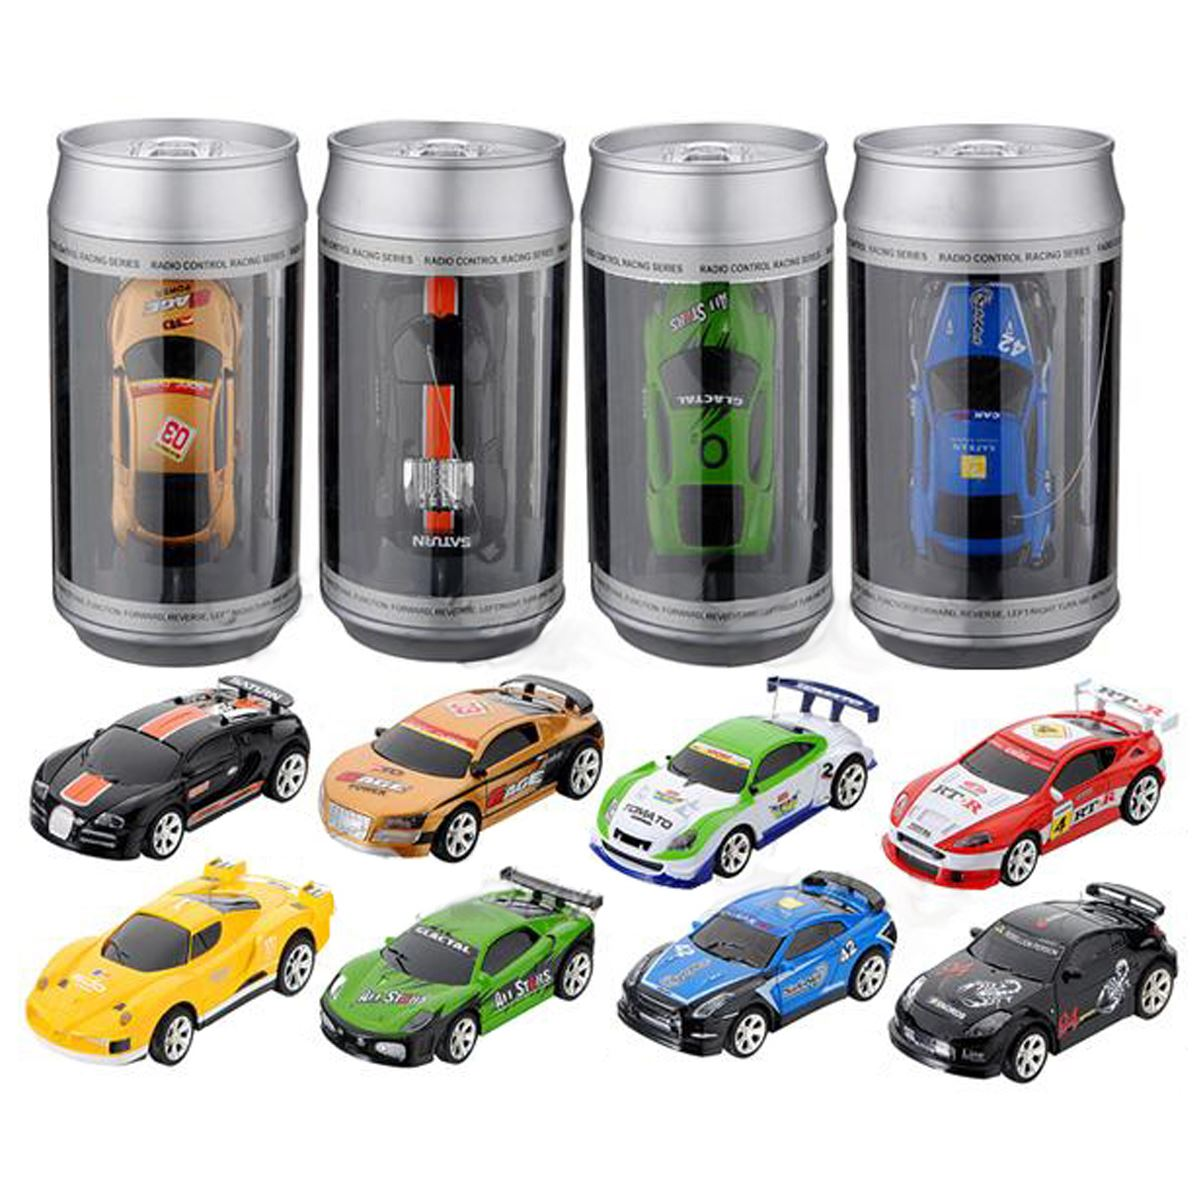 8 colores en oferta 20 km/h Coke Can Mini RC coche Radio Control remoto Micro Racing coche 4 frecuencias juguete para niños